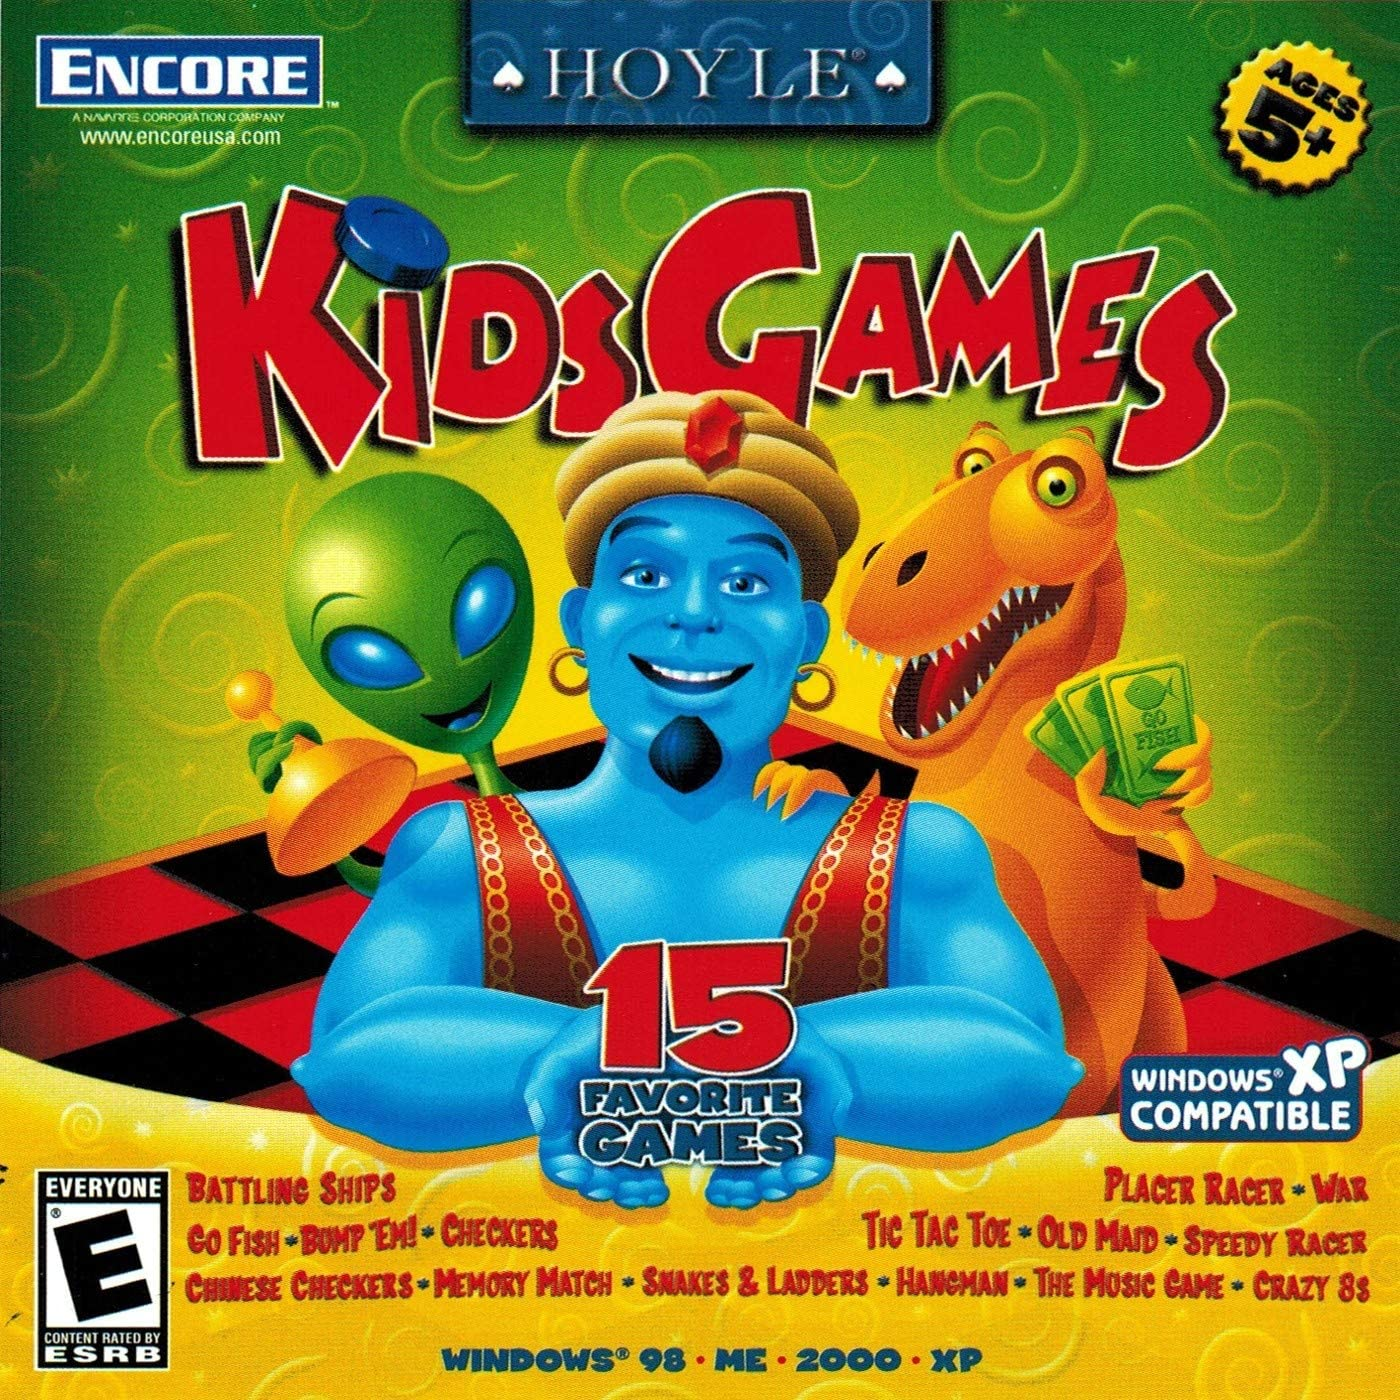 B000DZCFC8 HOYLE KIDS GAMES 81z4twDTzrL